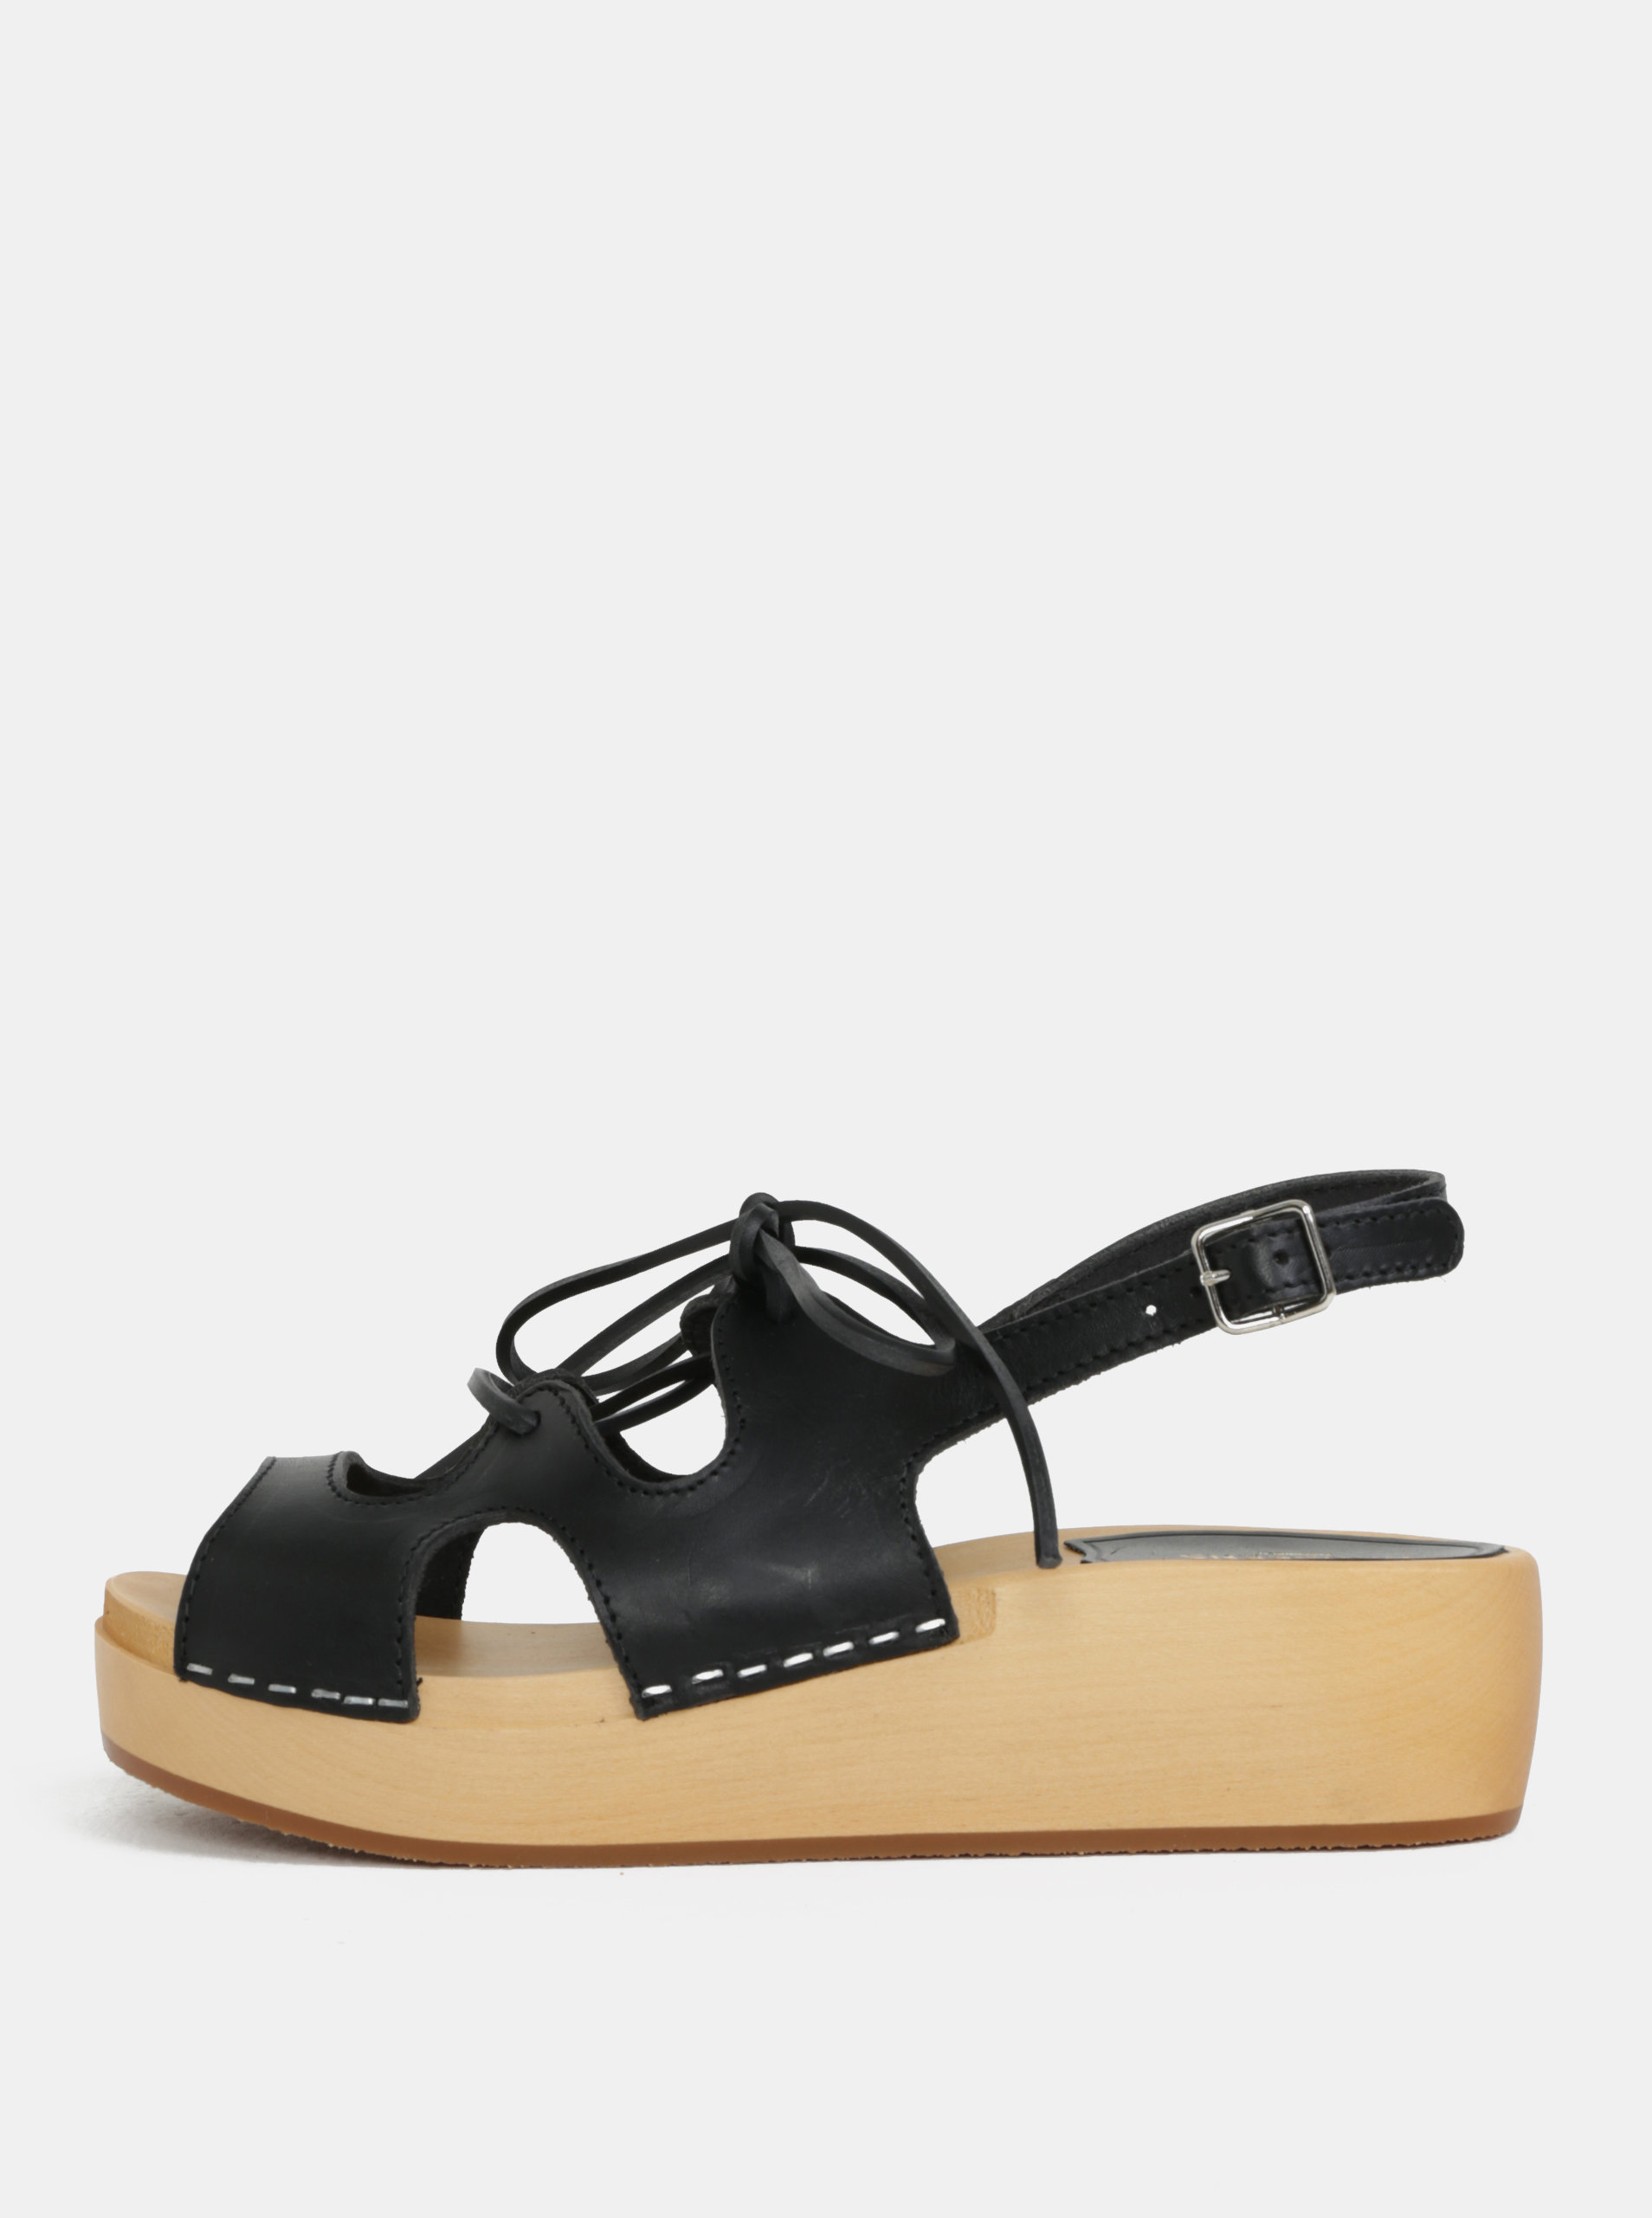 8020013b13a07 Dreváky na platforme s čiernymi koženými remienkami Swedish Hasbeens Lace  Up Sandal ...